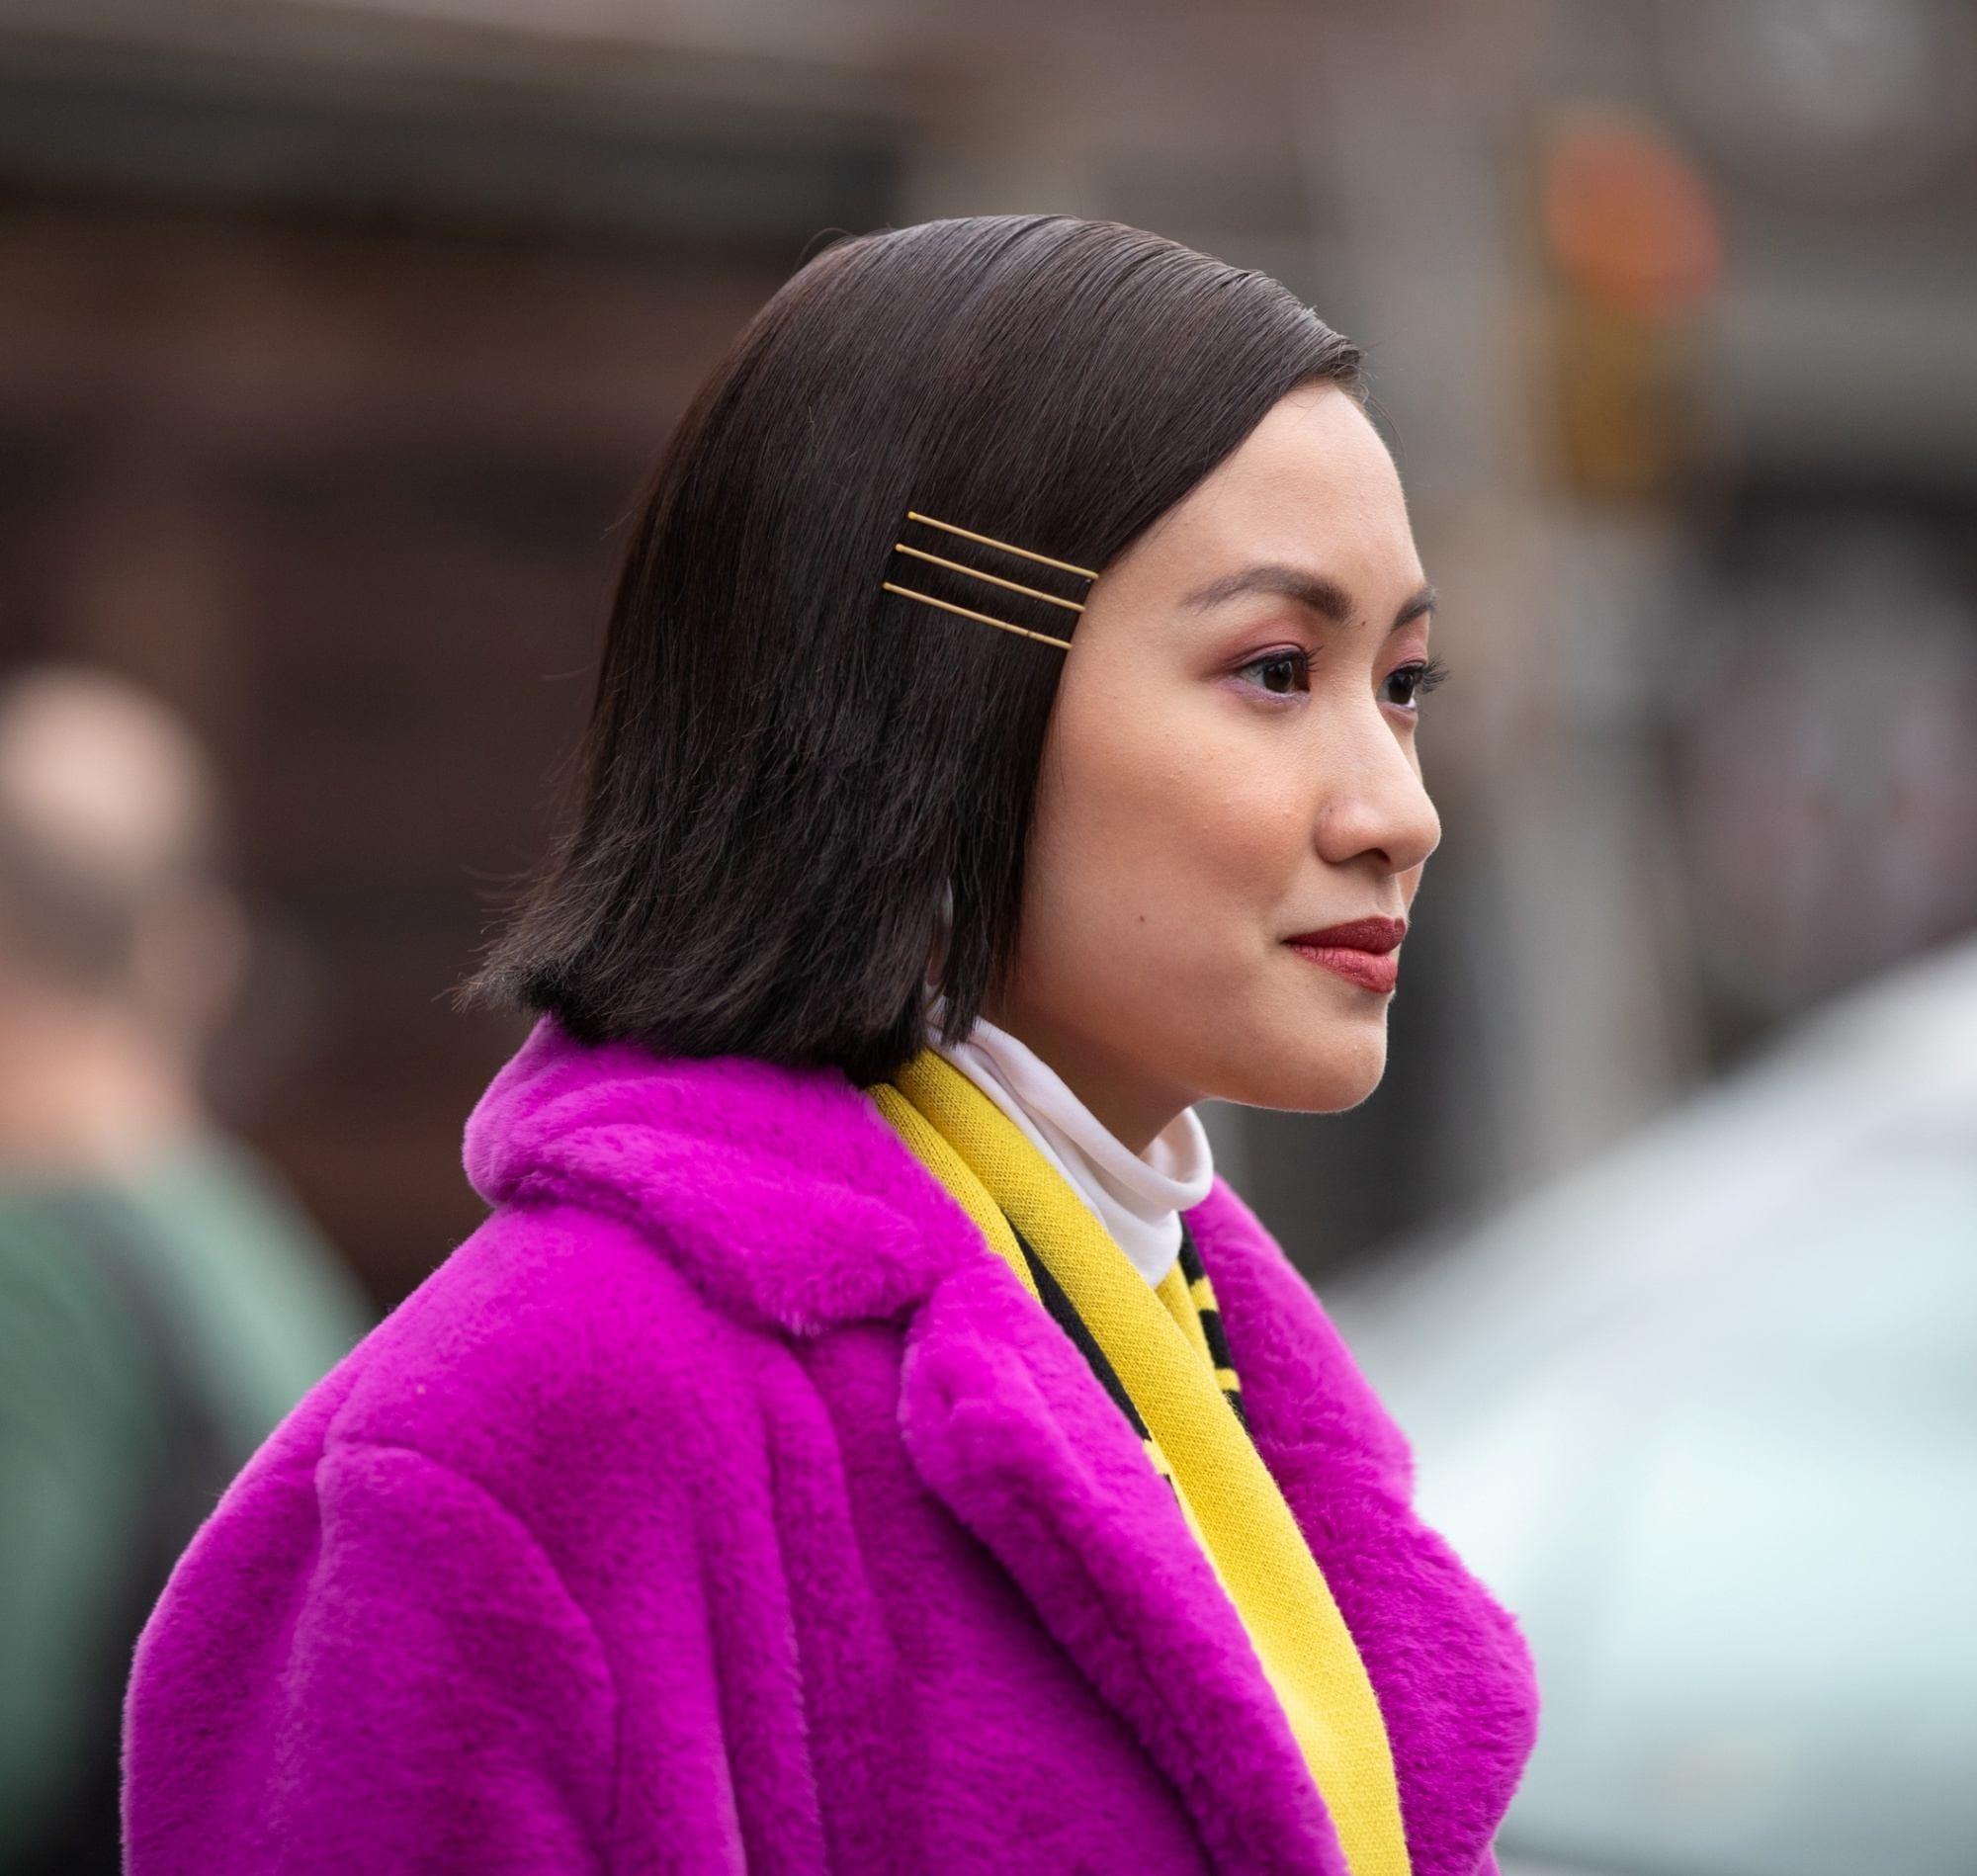 Short hairstyles for Filipinas: Closeup profile shot of Laureen Uy with short dark hair wearing a pink coat